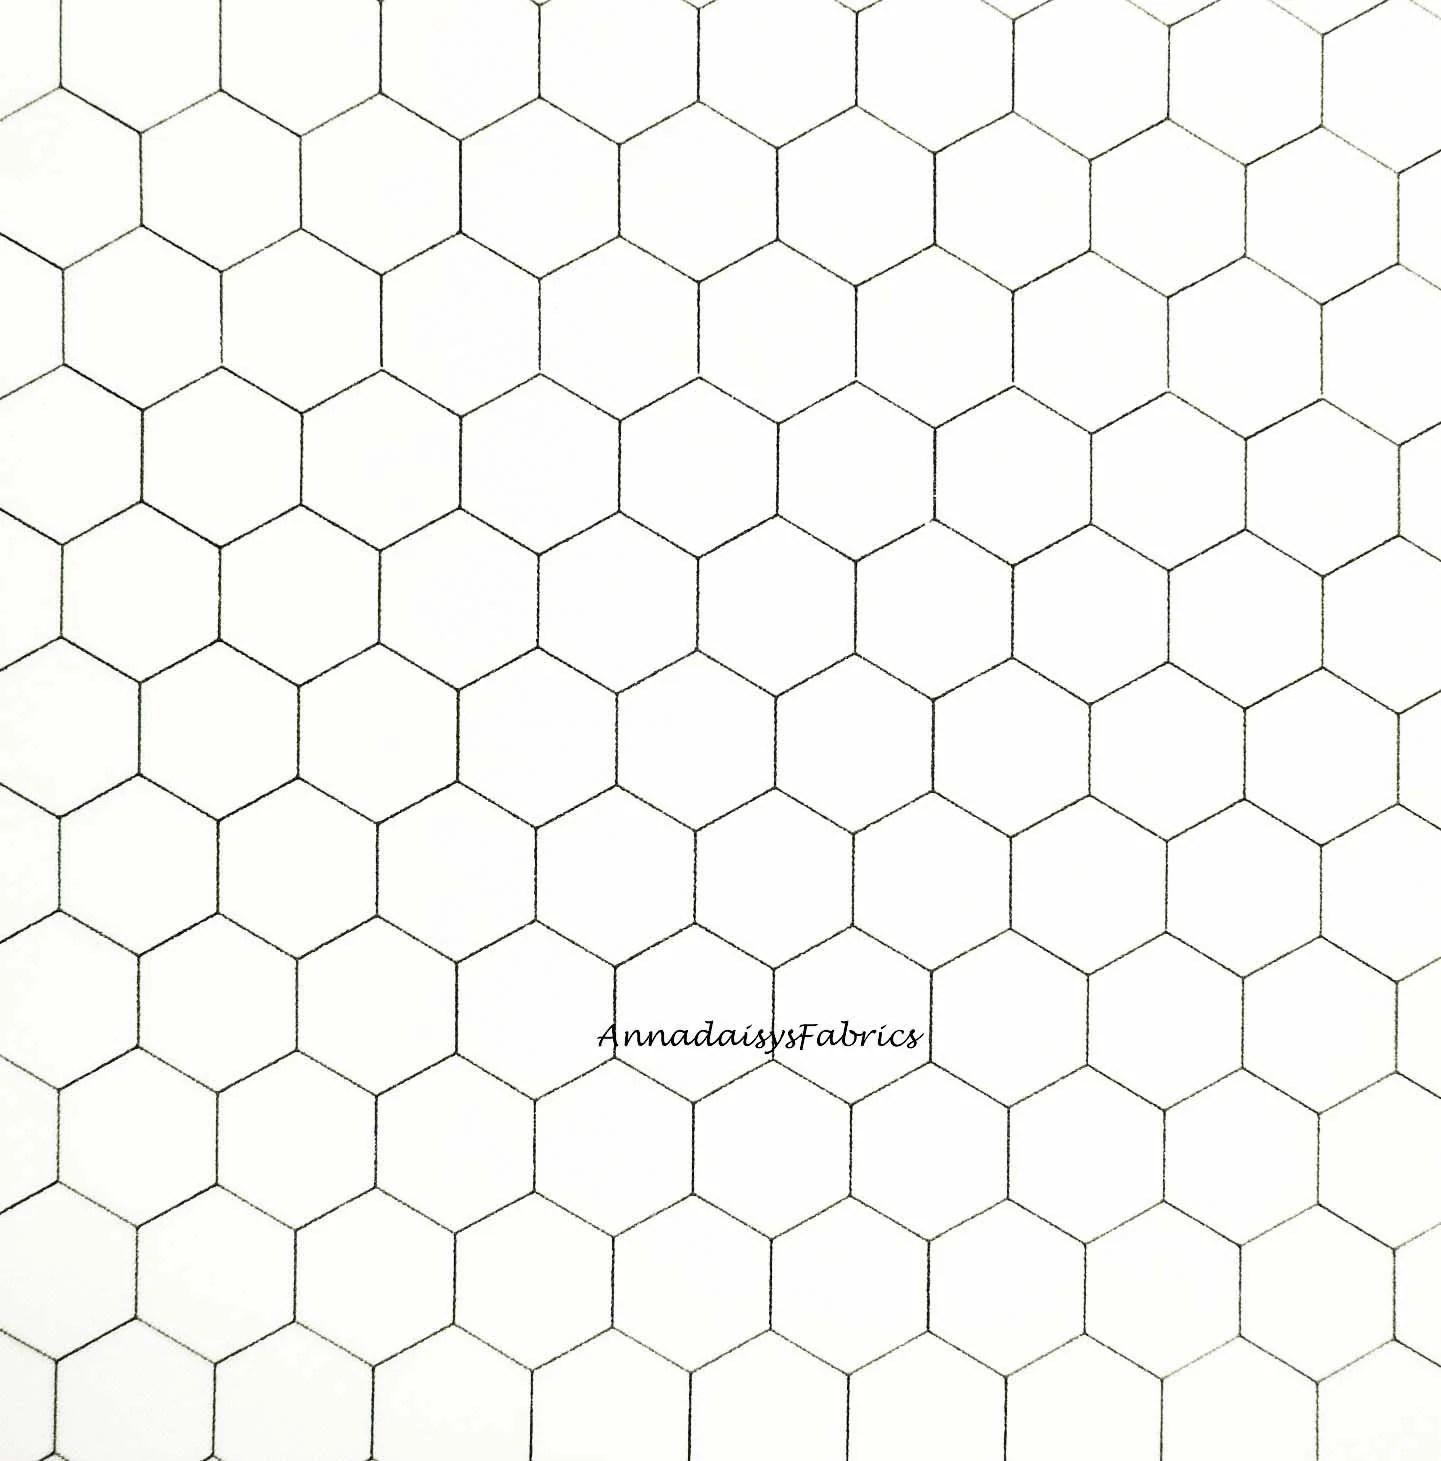 Chicken Wire Fabric Moda 8255 1 Black and White Chicken Wire